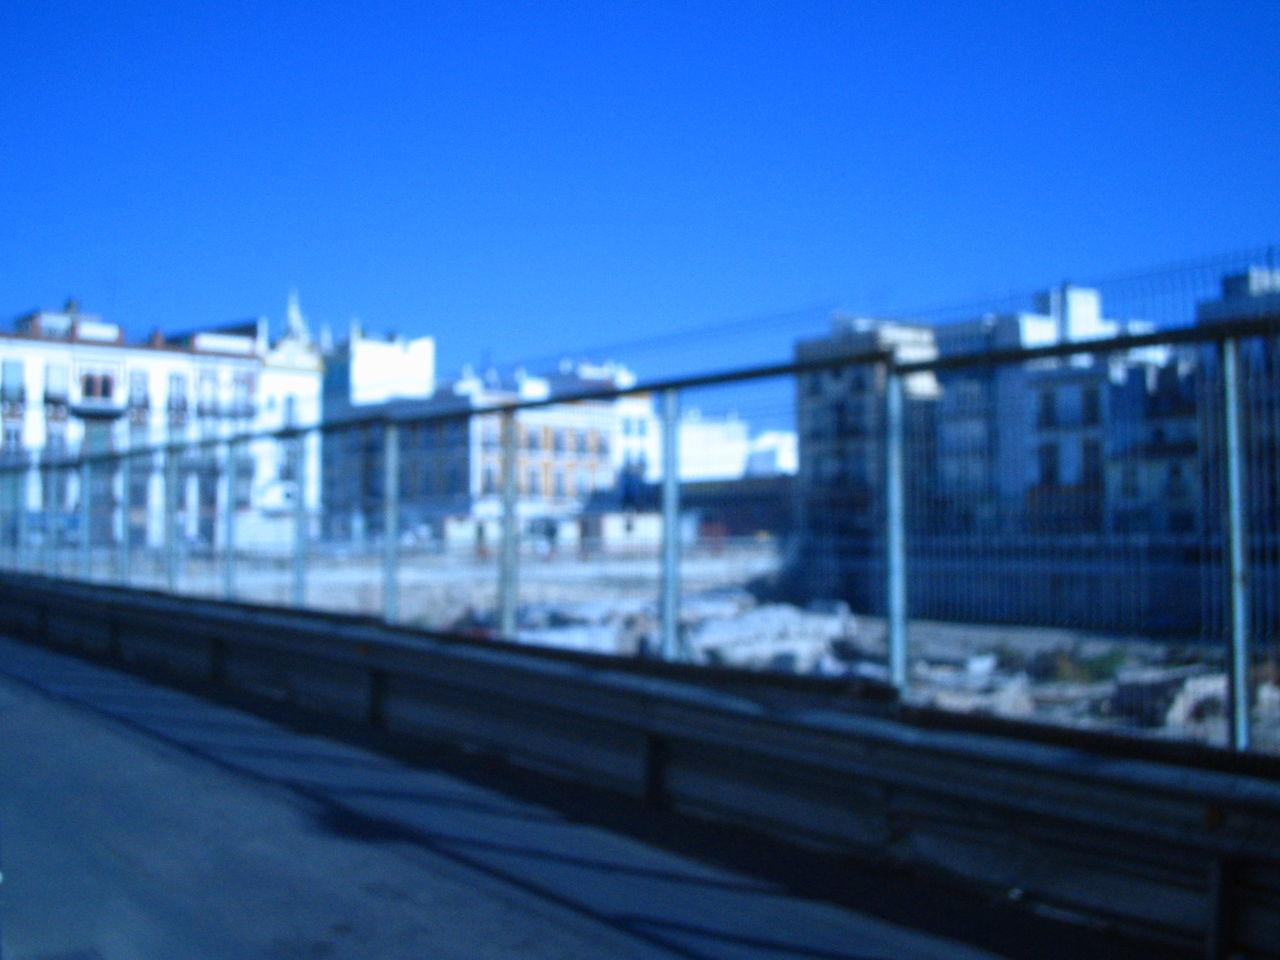 blue, transportation, rail transportation, built structure, architecture, railroad track, no people, train - vehicle, public transportation, building exterior, clear sky, day, outdoors, sky